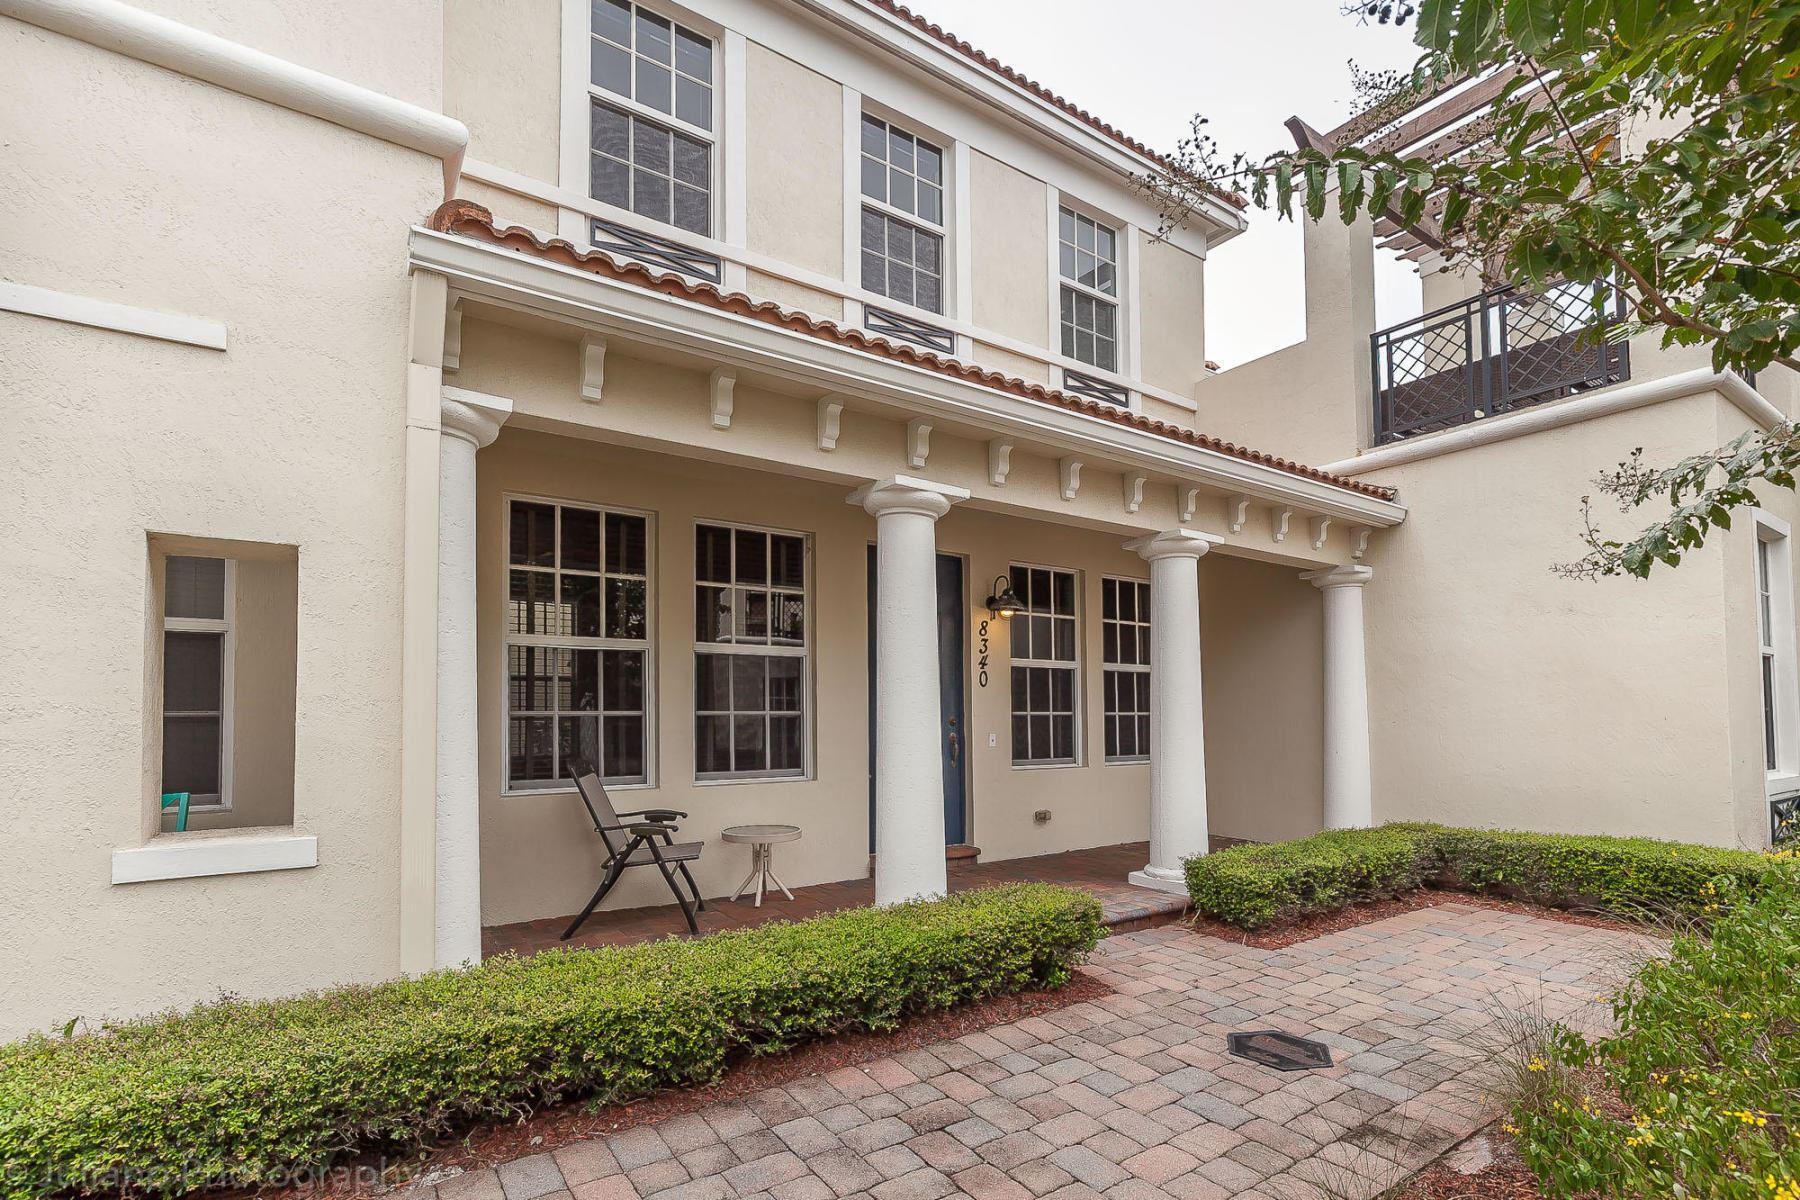 8340 NW 7th Court, Boca Raton, FL 33487 - #: RX-10644215